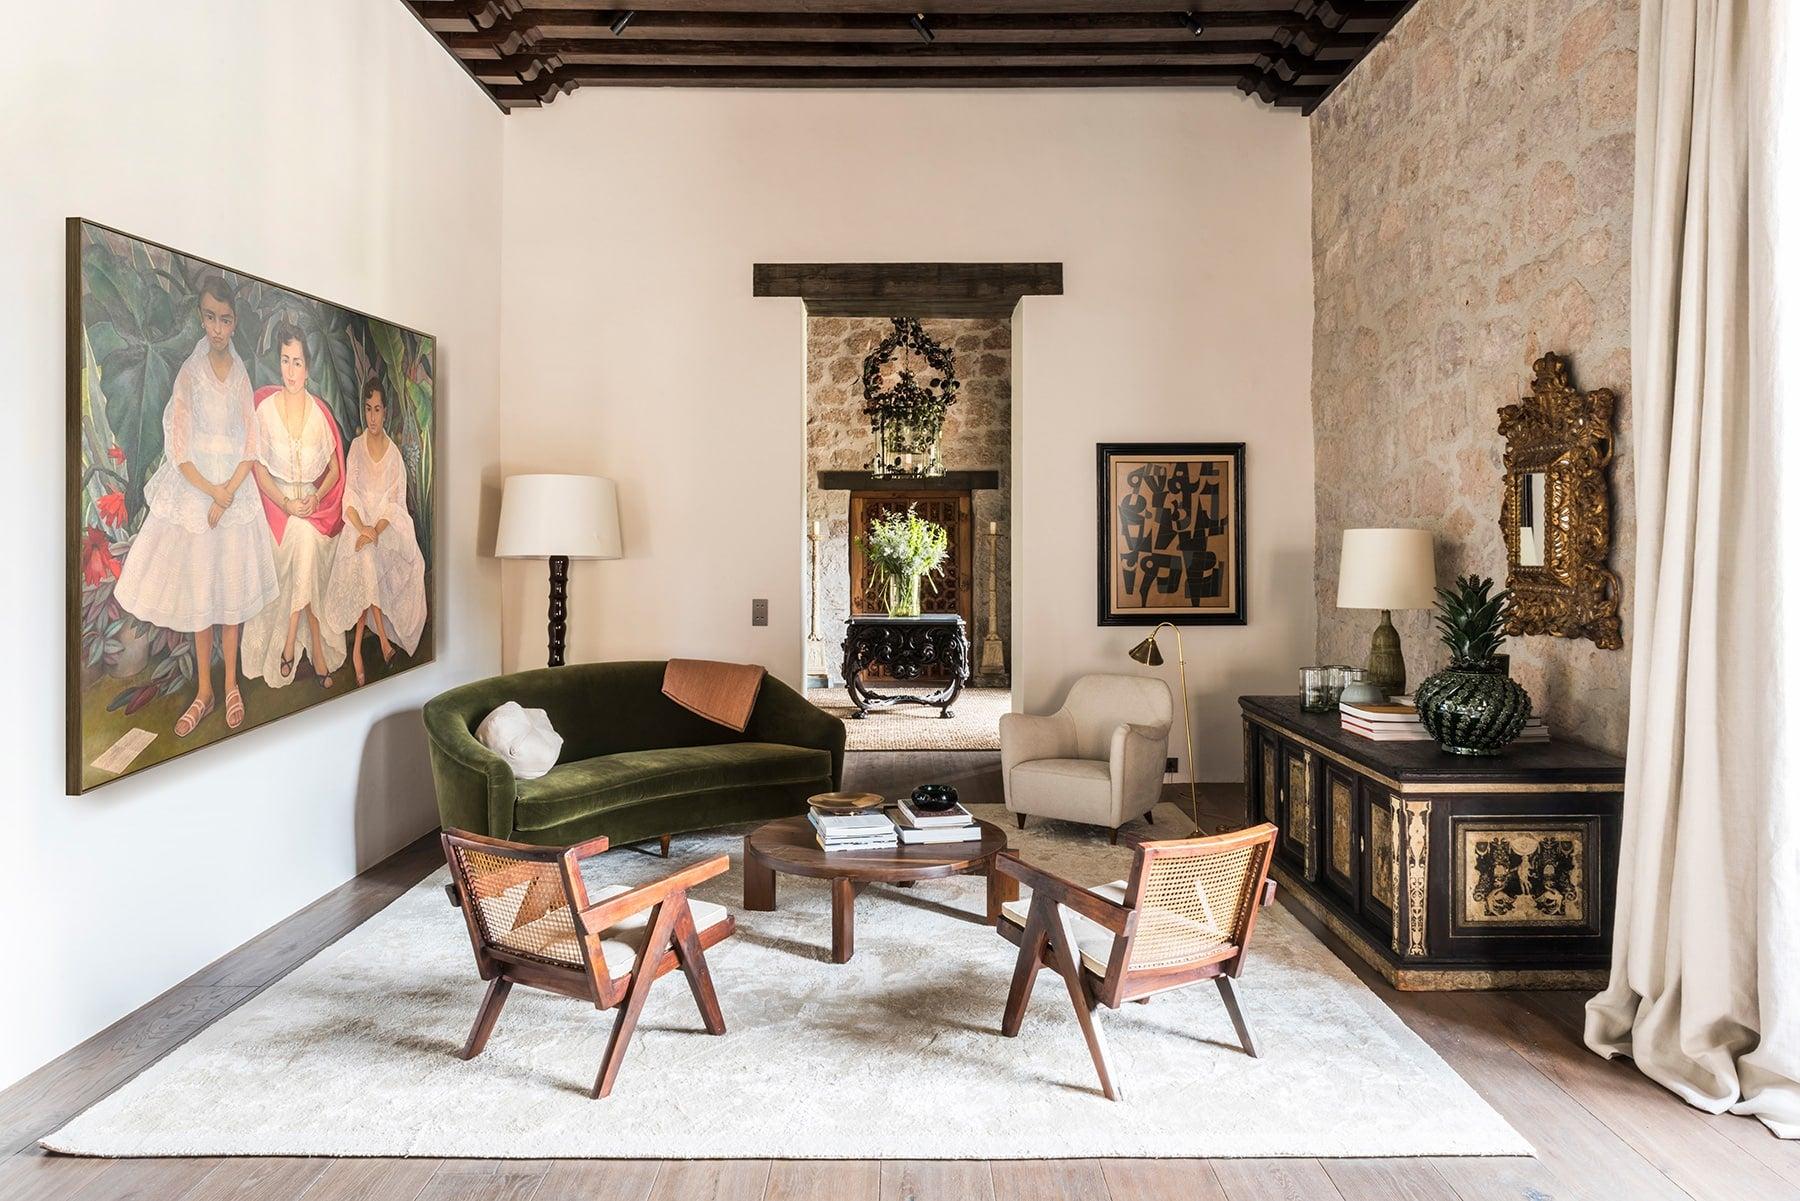 Luis Laplace Morelia Mexico Casa Michelena living room